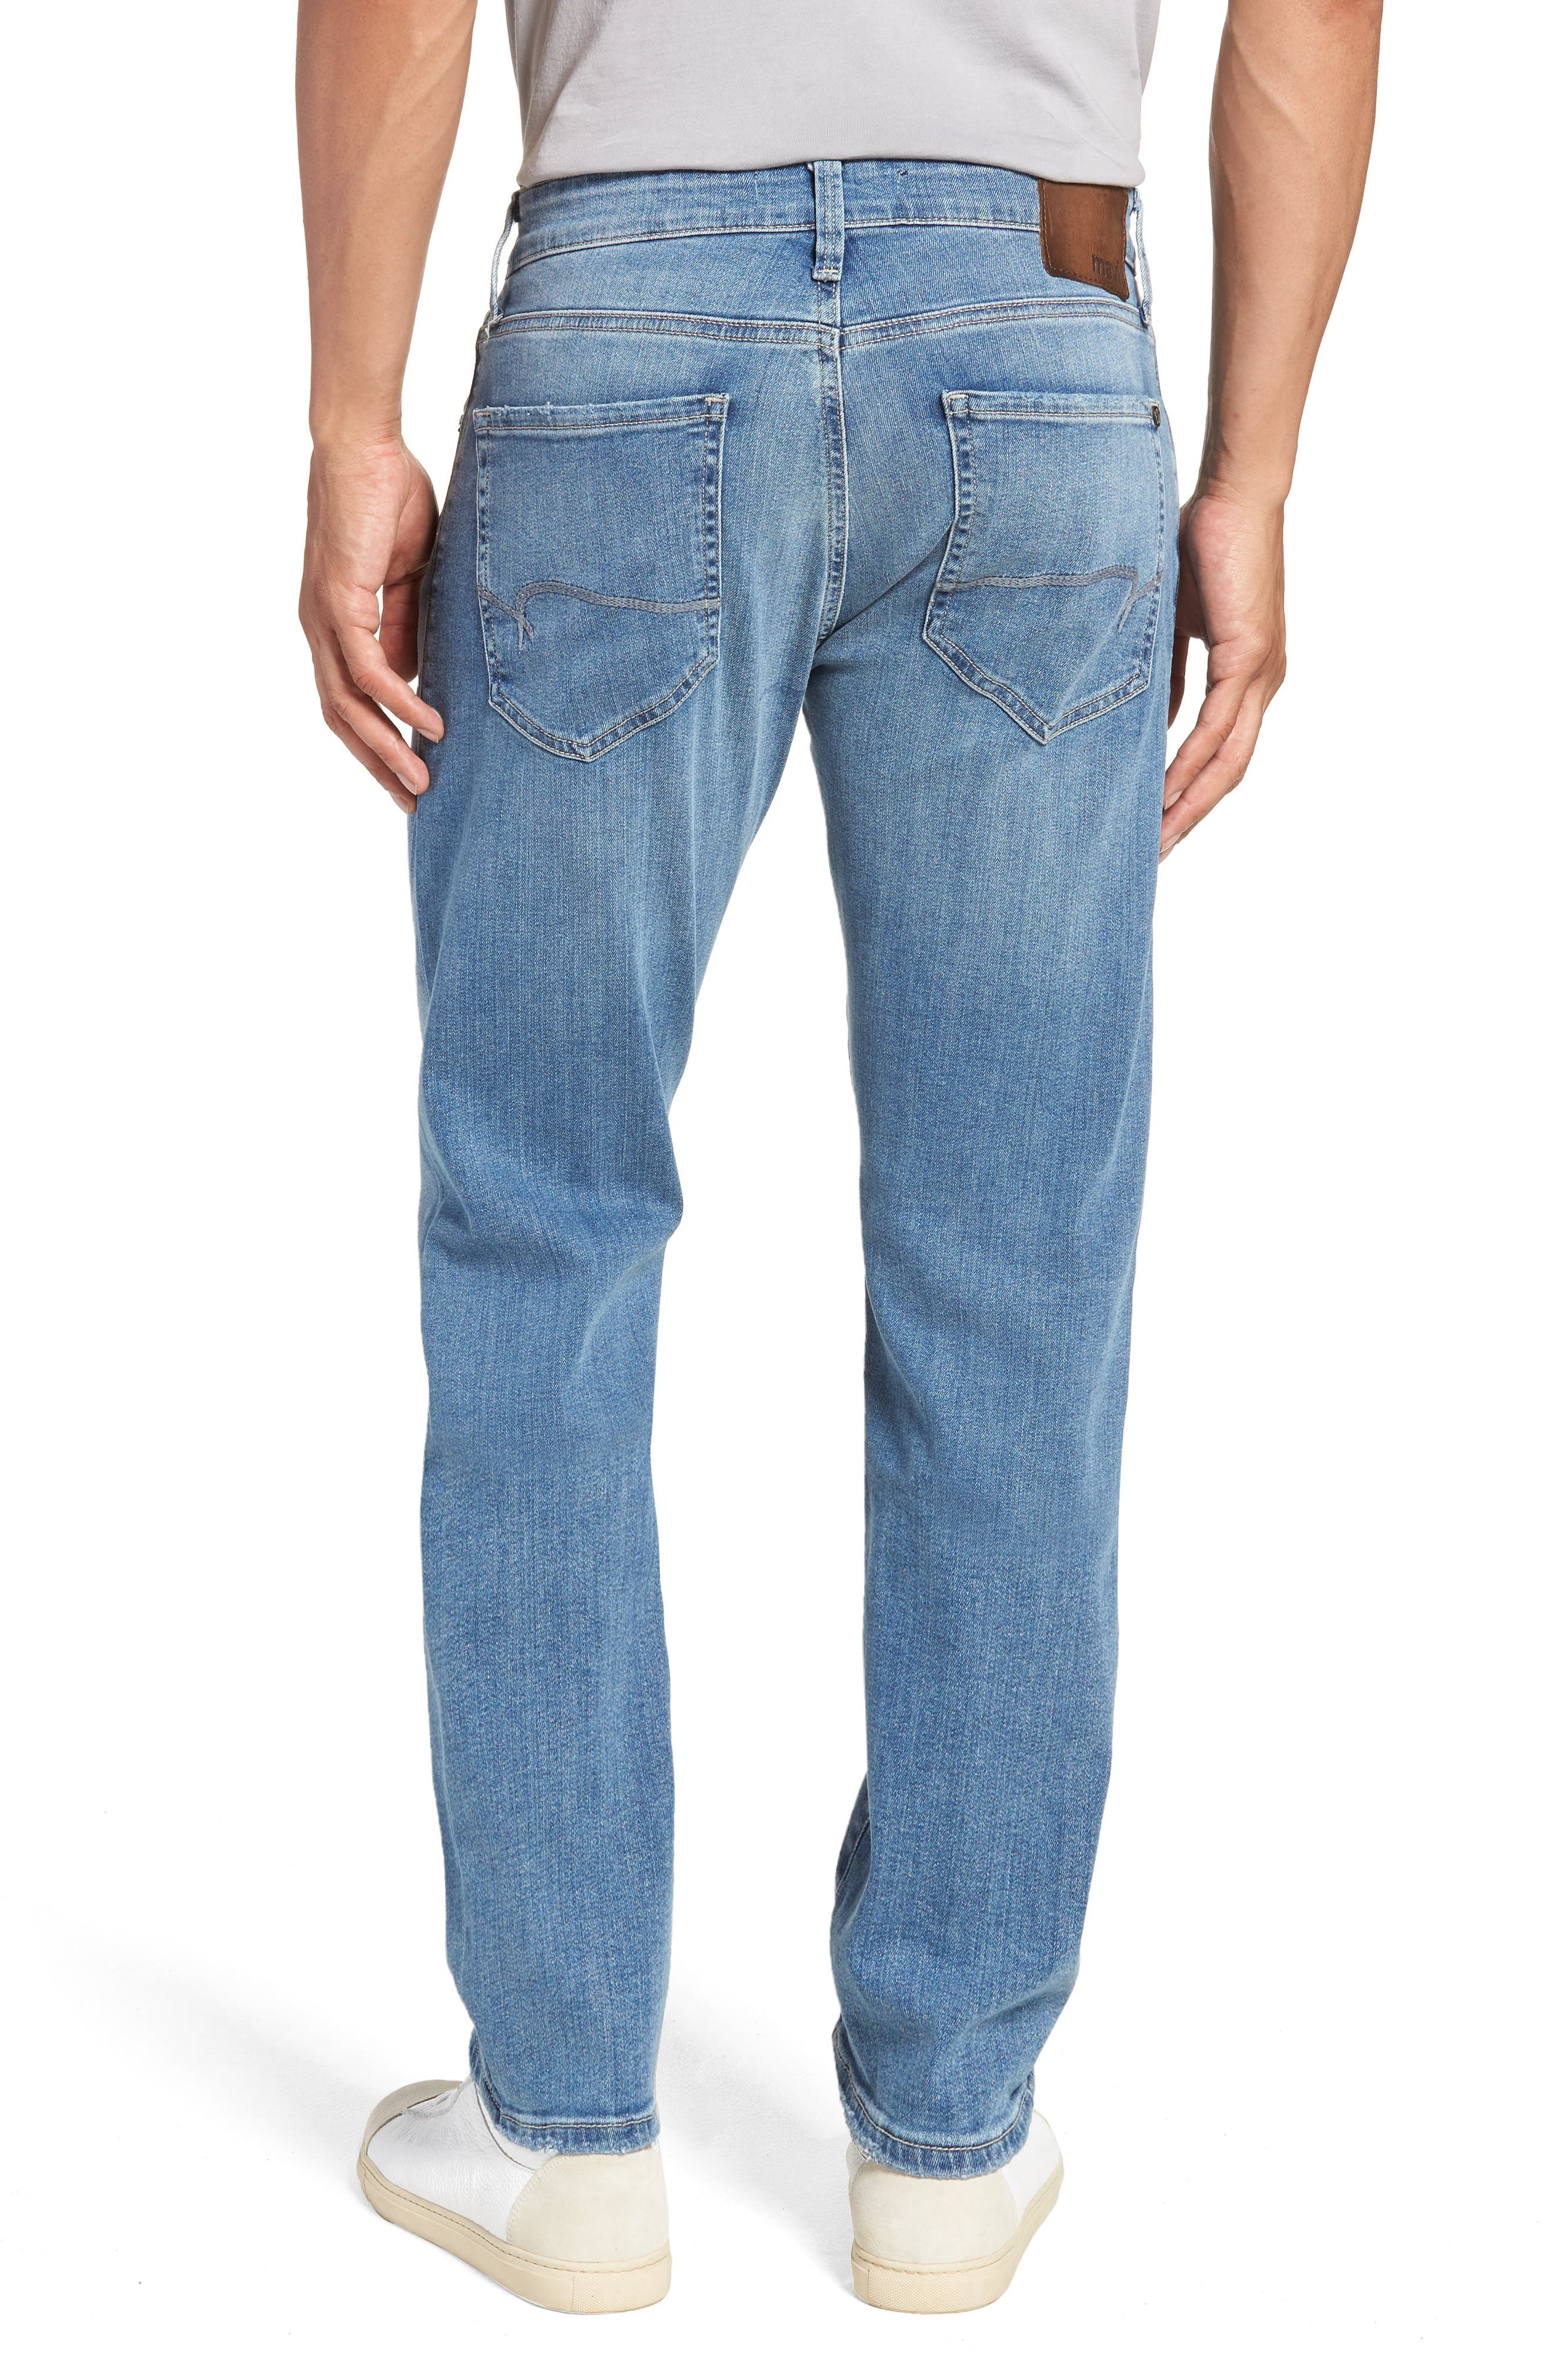 Jake Slim Fit Jeans,                             Alternate thumbnail 2, color,                             Light Blue Willamsburg